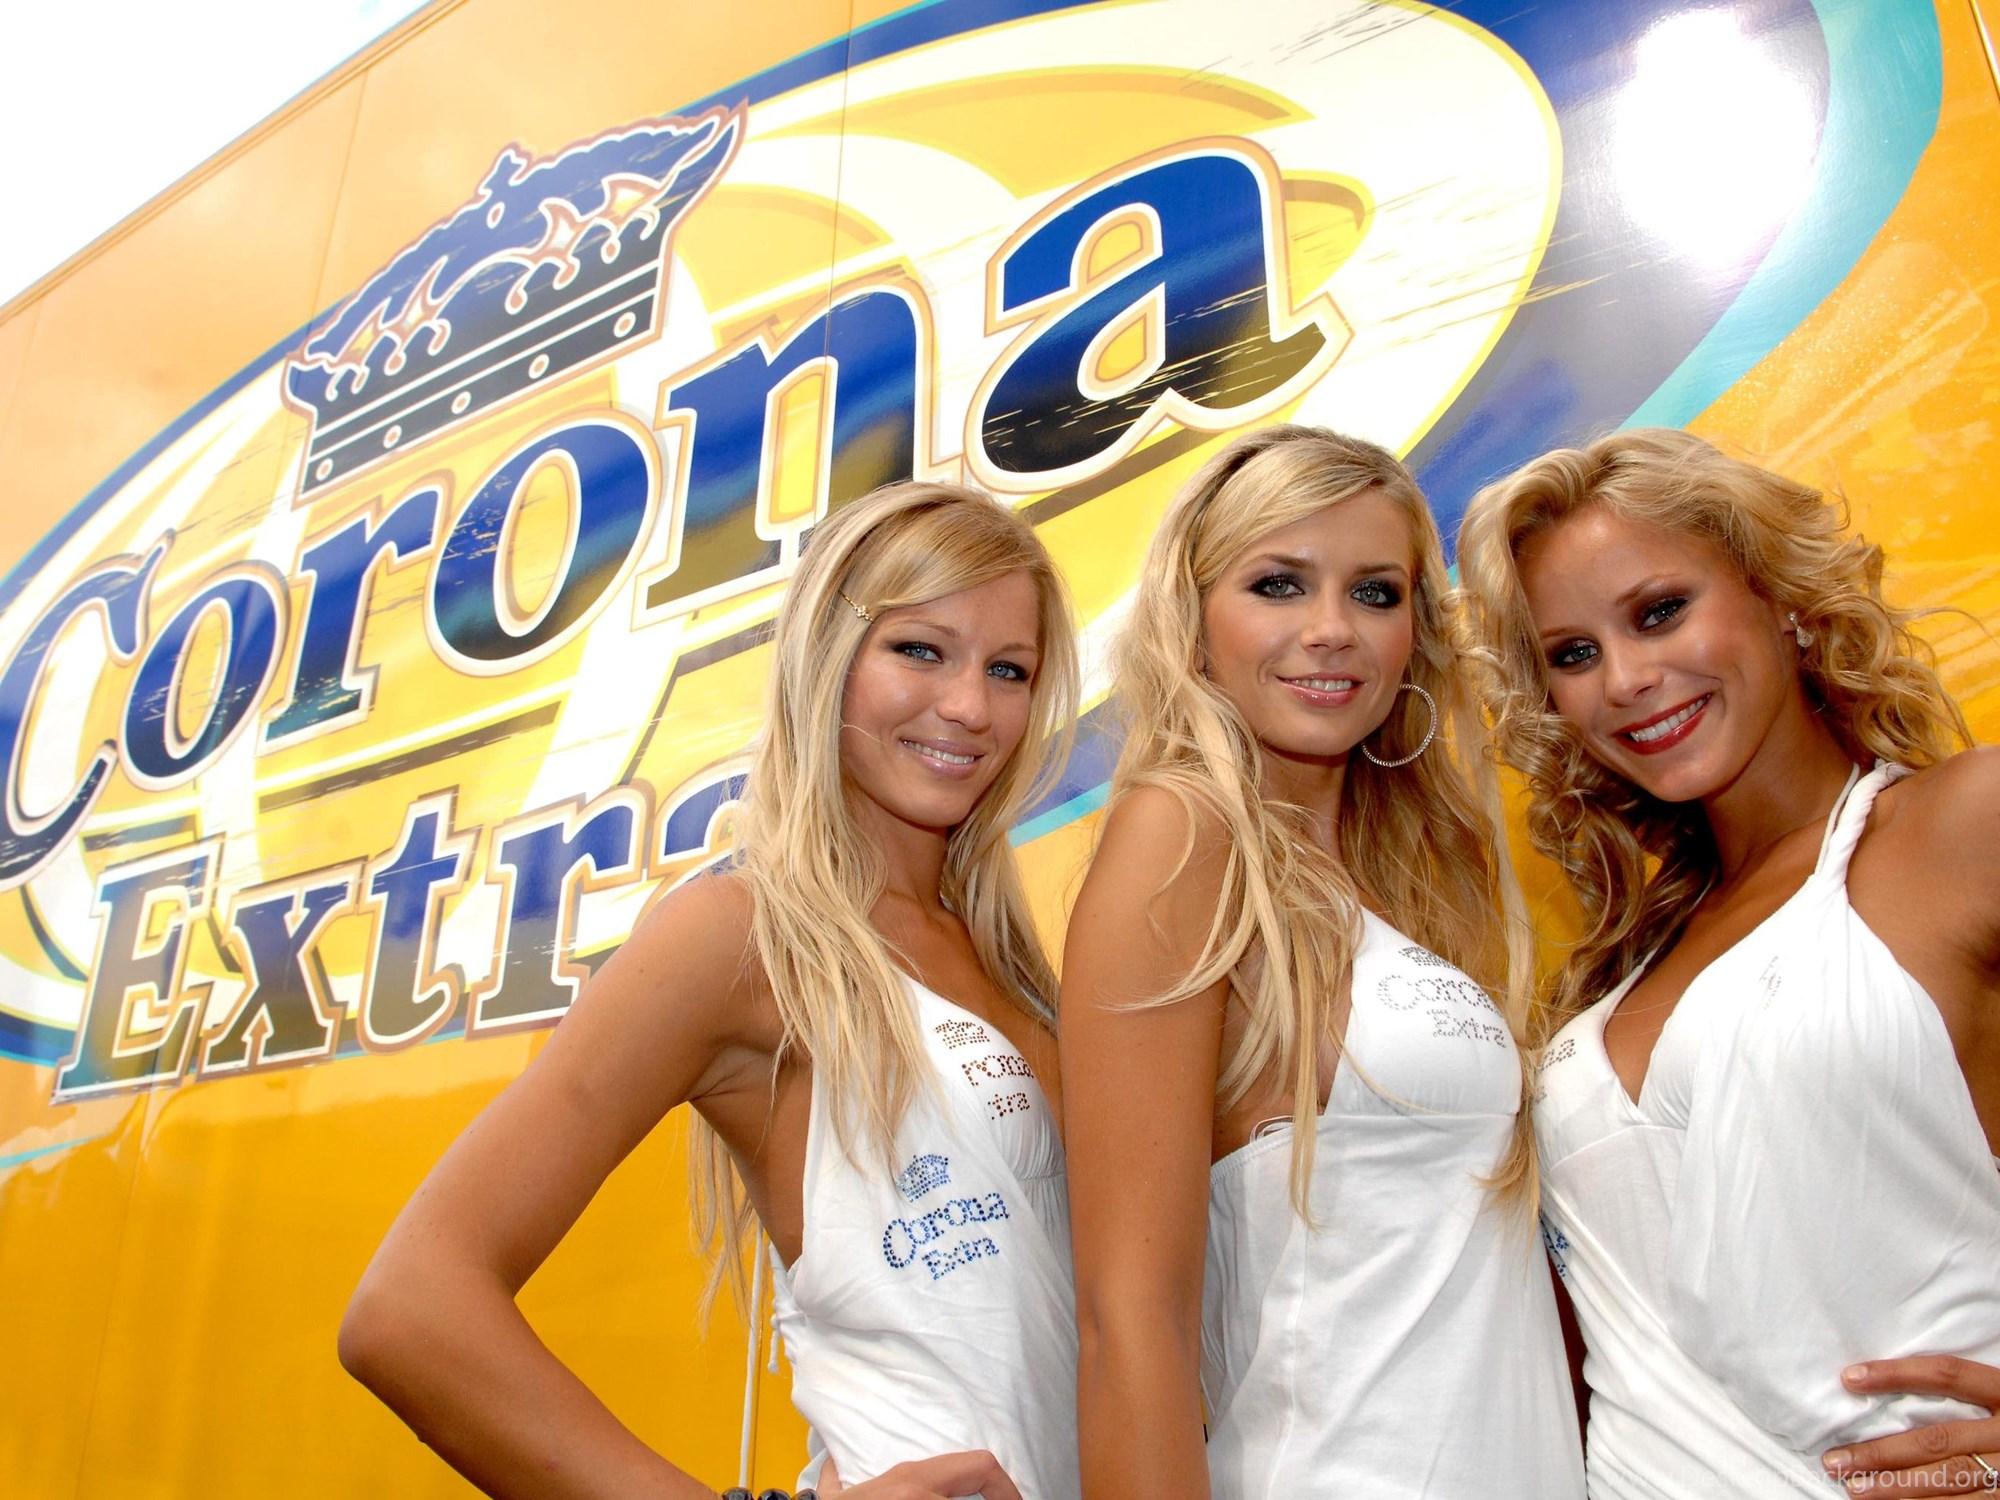 Corona Rare Sexy Latina Bikini Girl Beer Poster